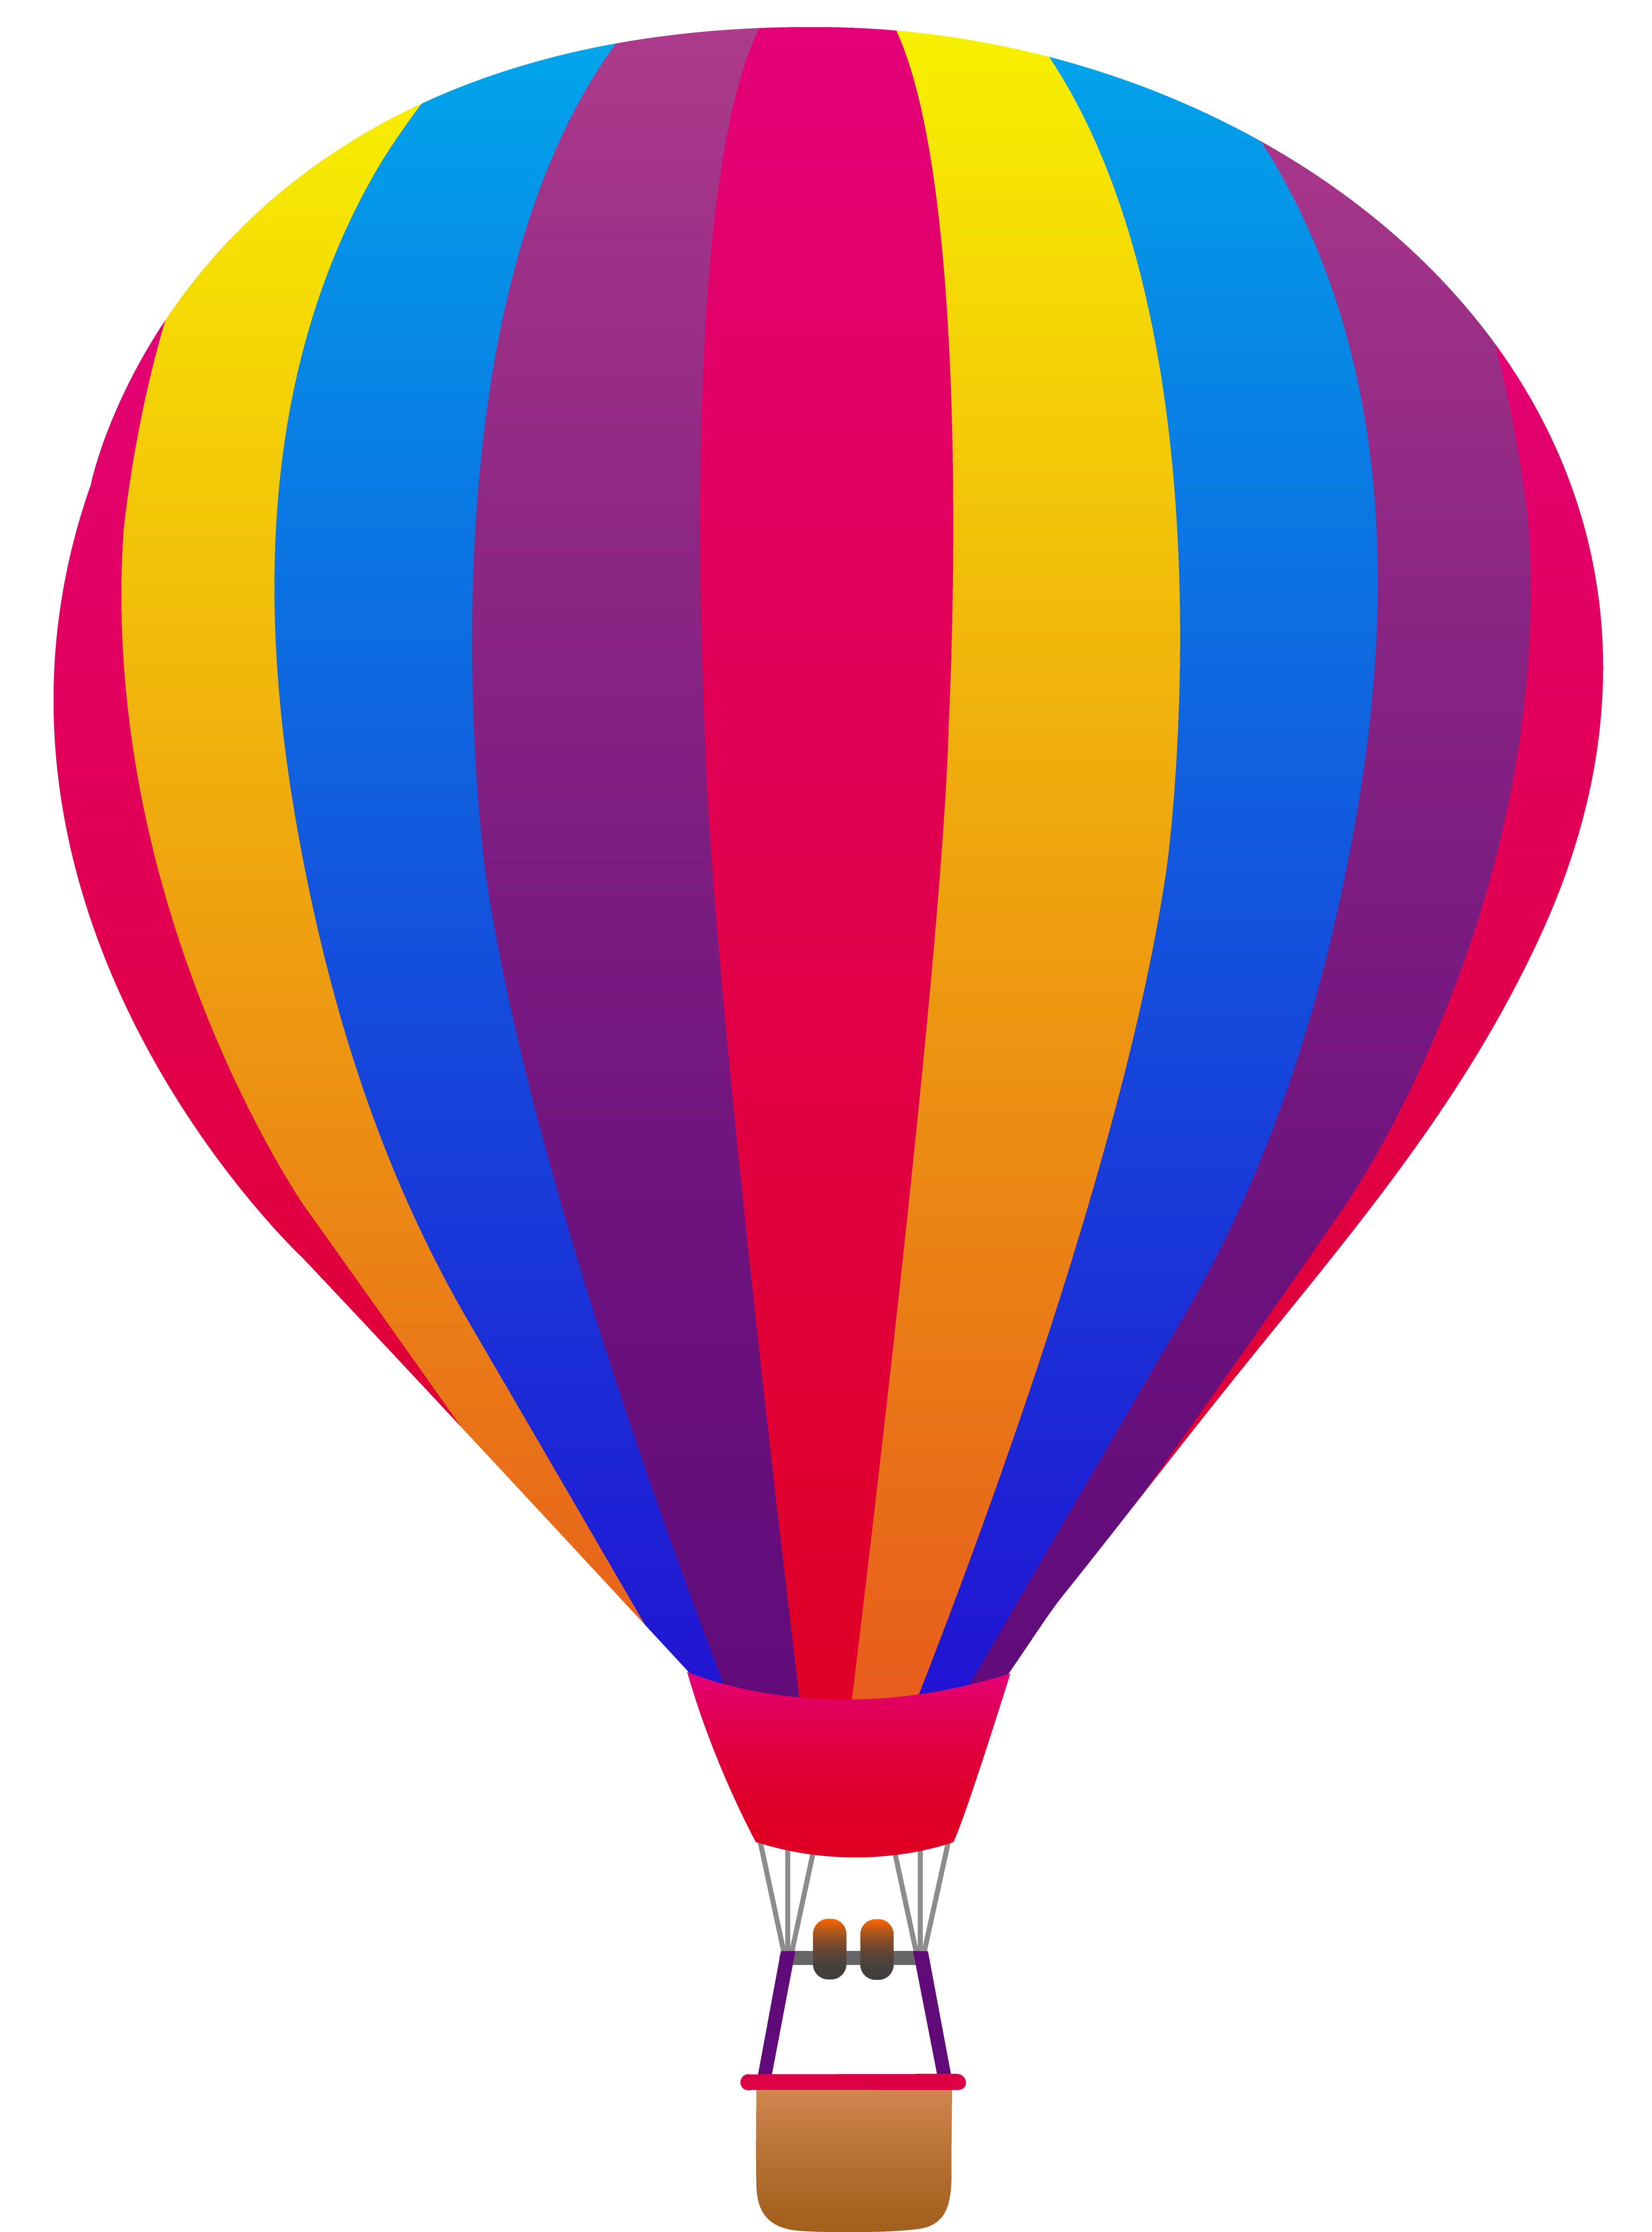 Hot Air Balloon clipart #4, Download drawings